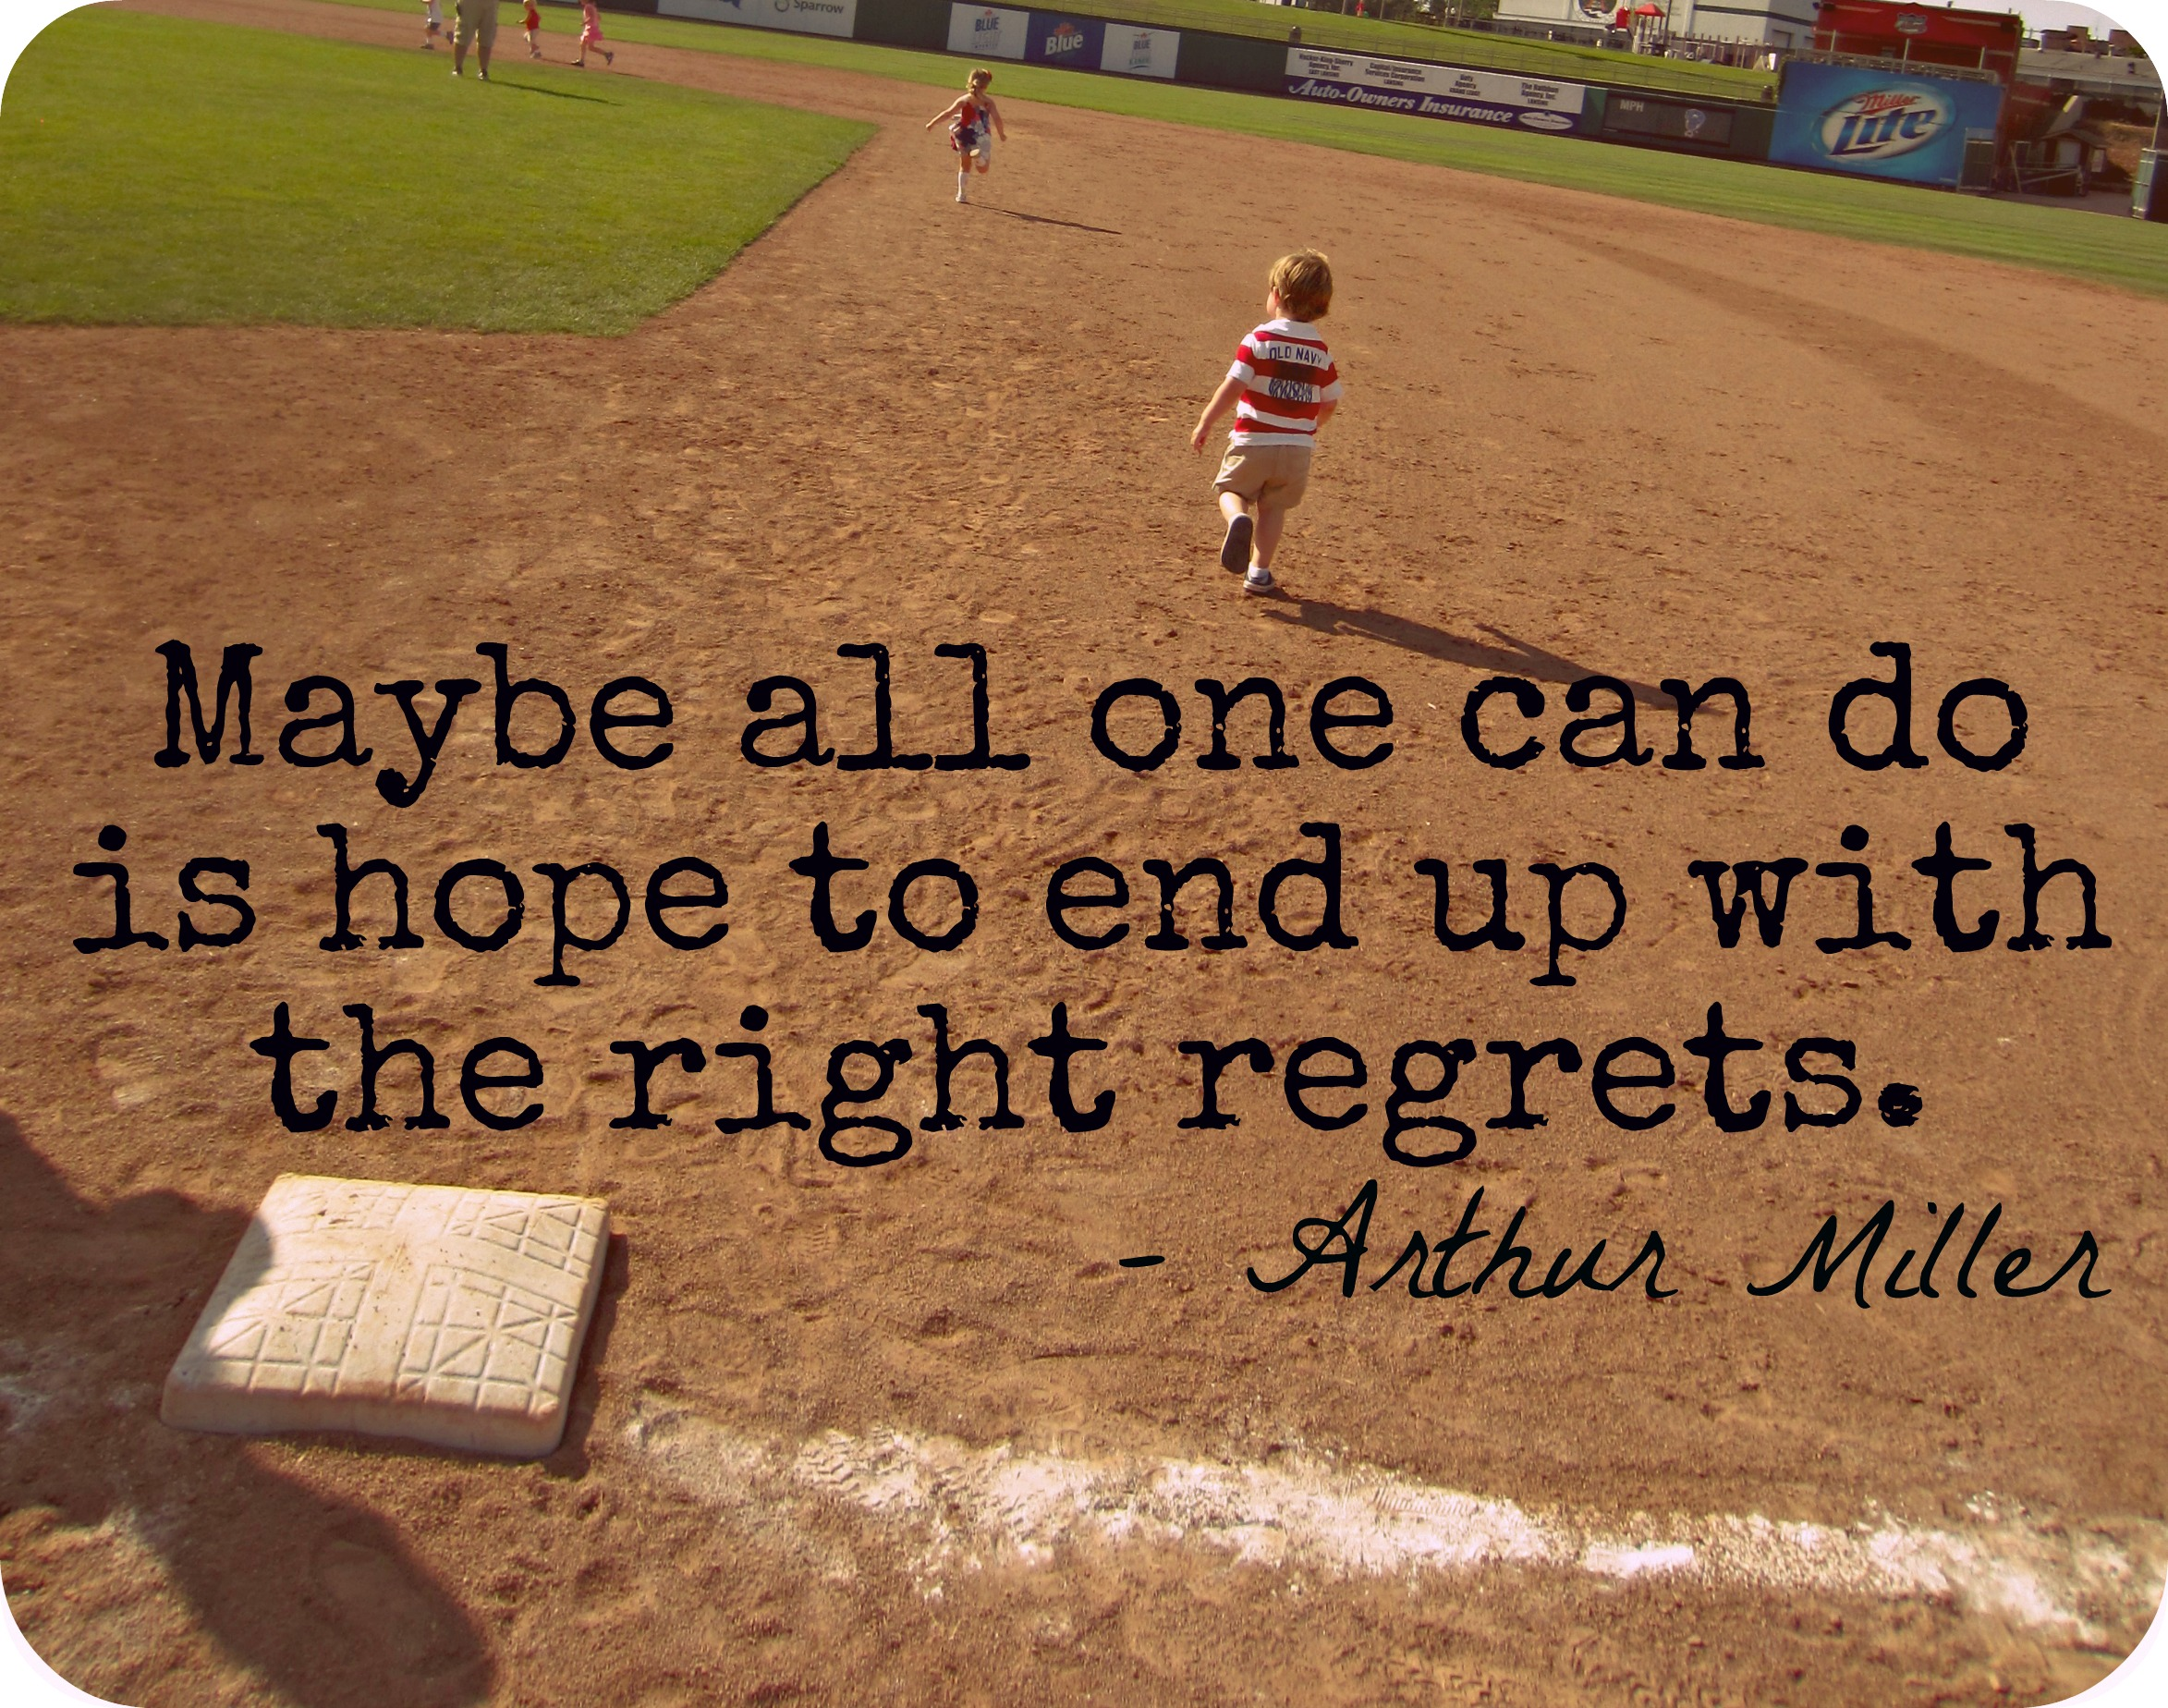 Arthur Miller's quote